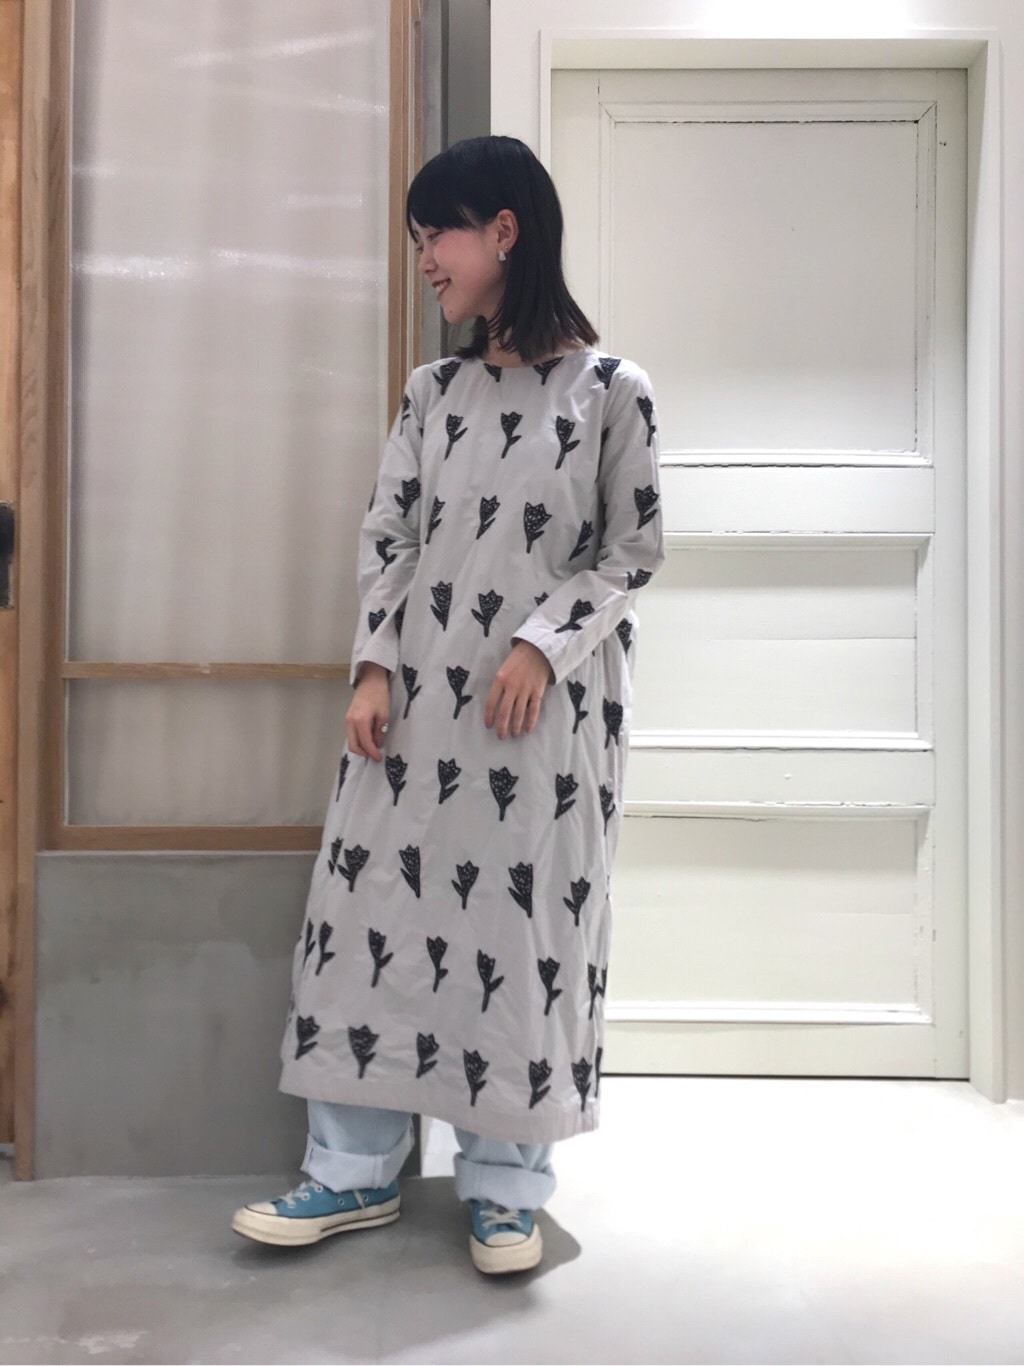 bulle de savon 渋谷スクランブルスクエア 身長:153cm 2020.02.04